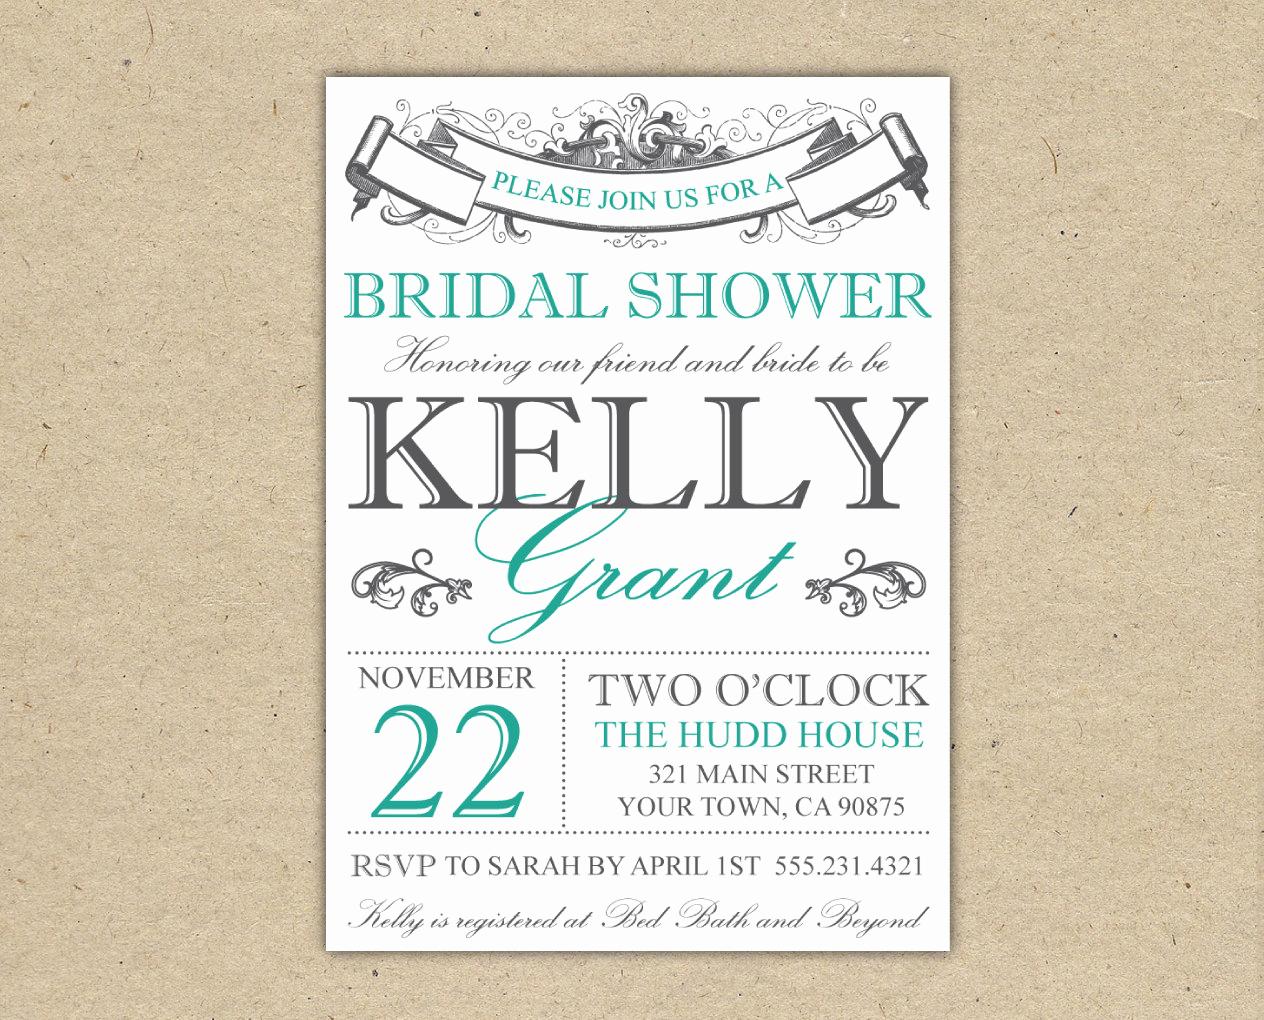 Free Bridal Shower Invitation Templates Elegant Chandeliers & Pendant Lights